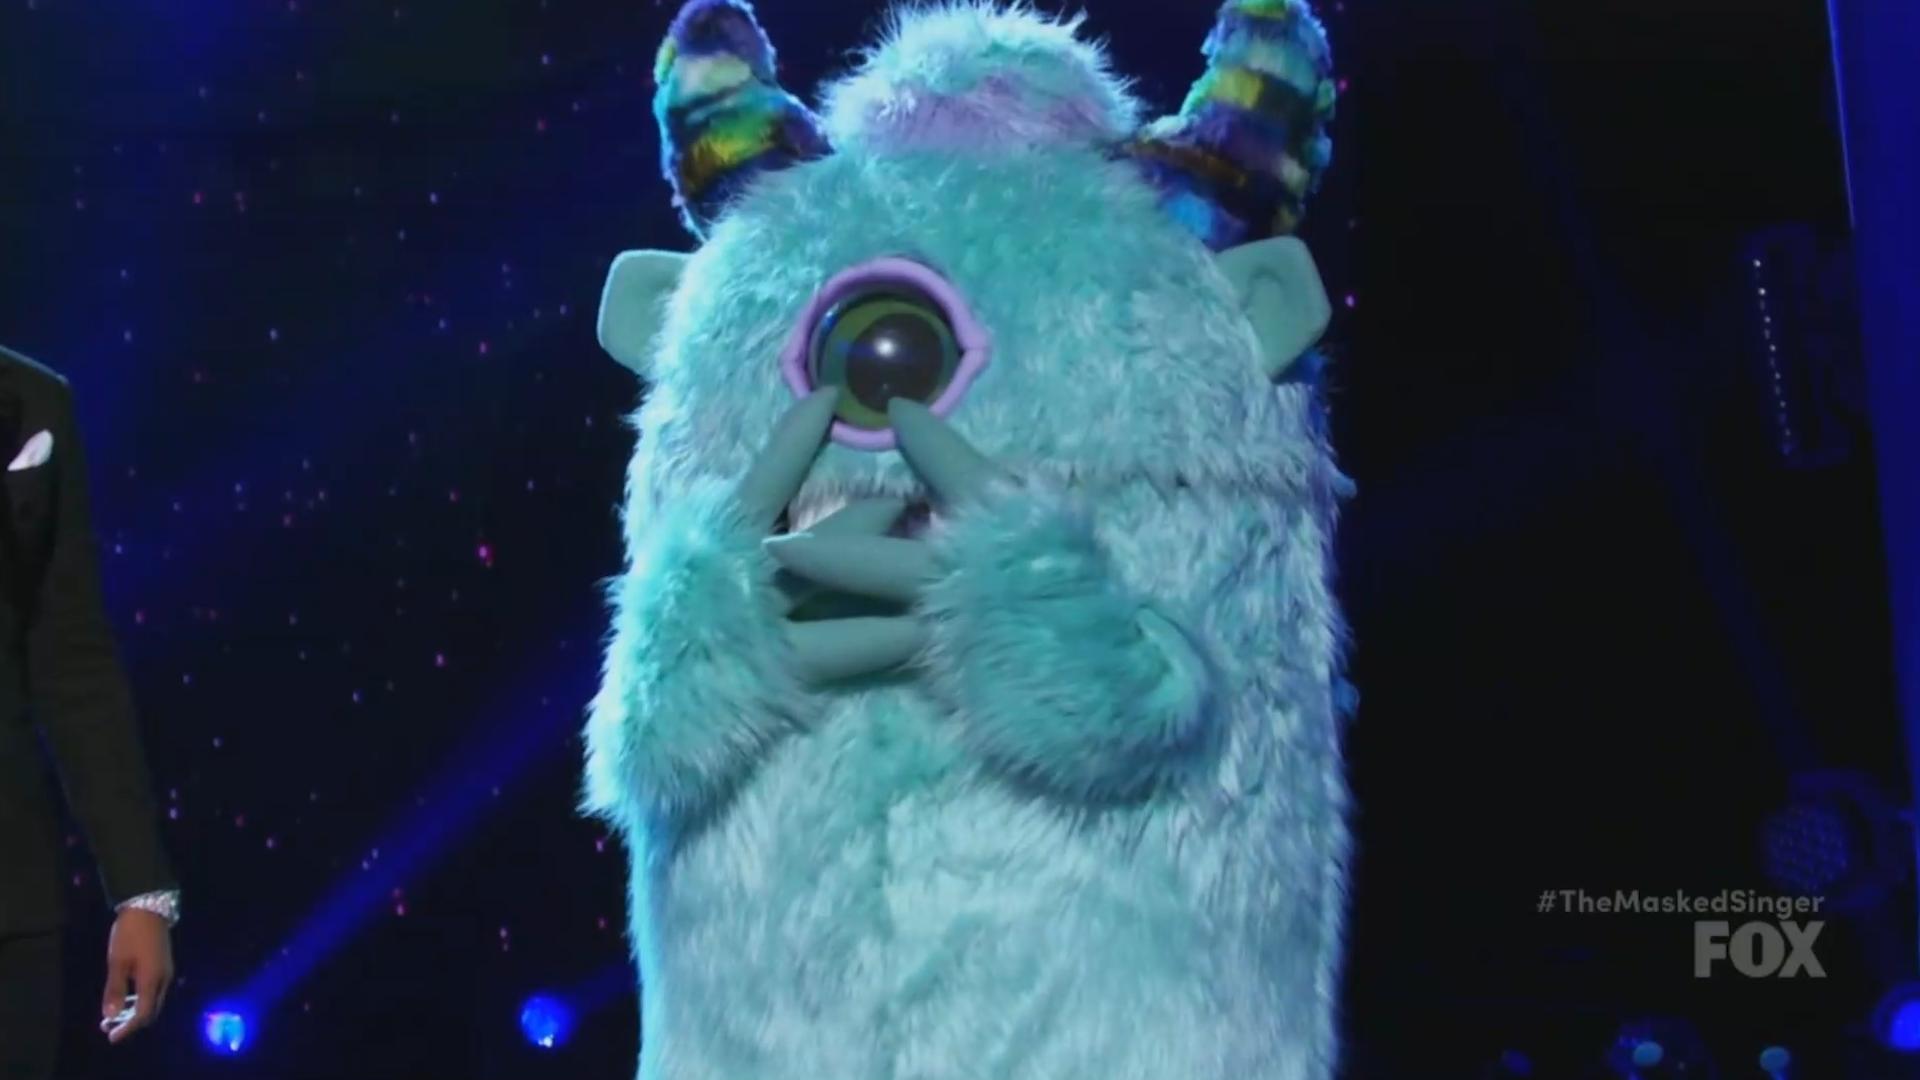 Rapper surprises as 'Masked Singer' champion